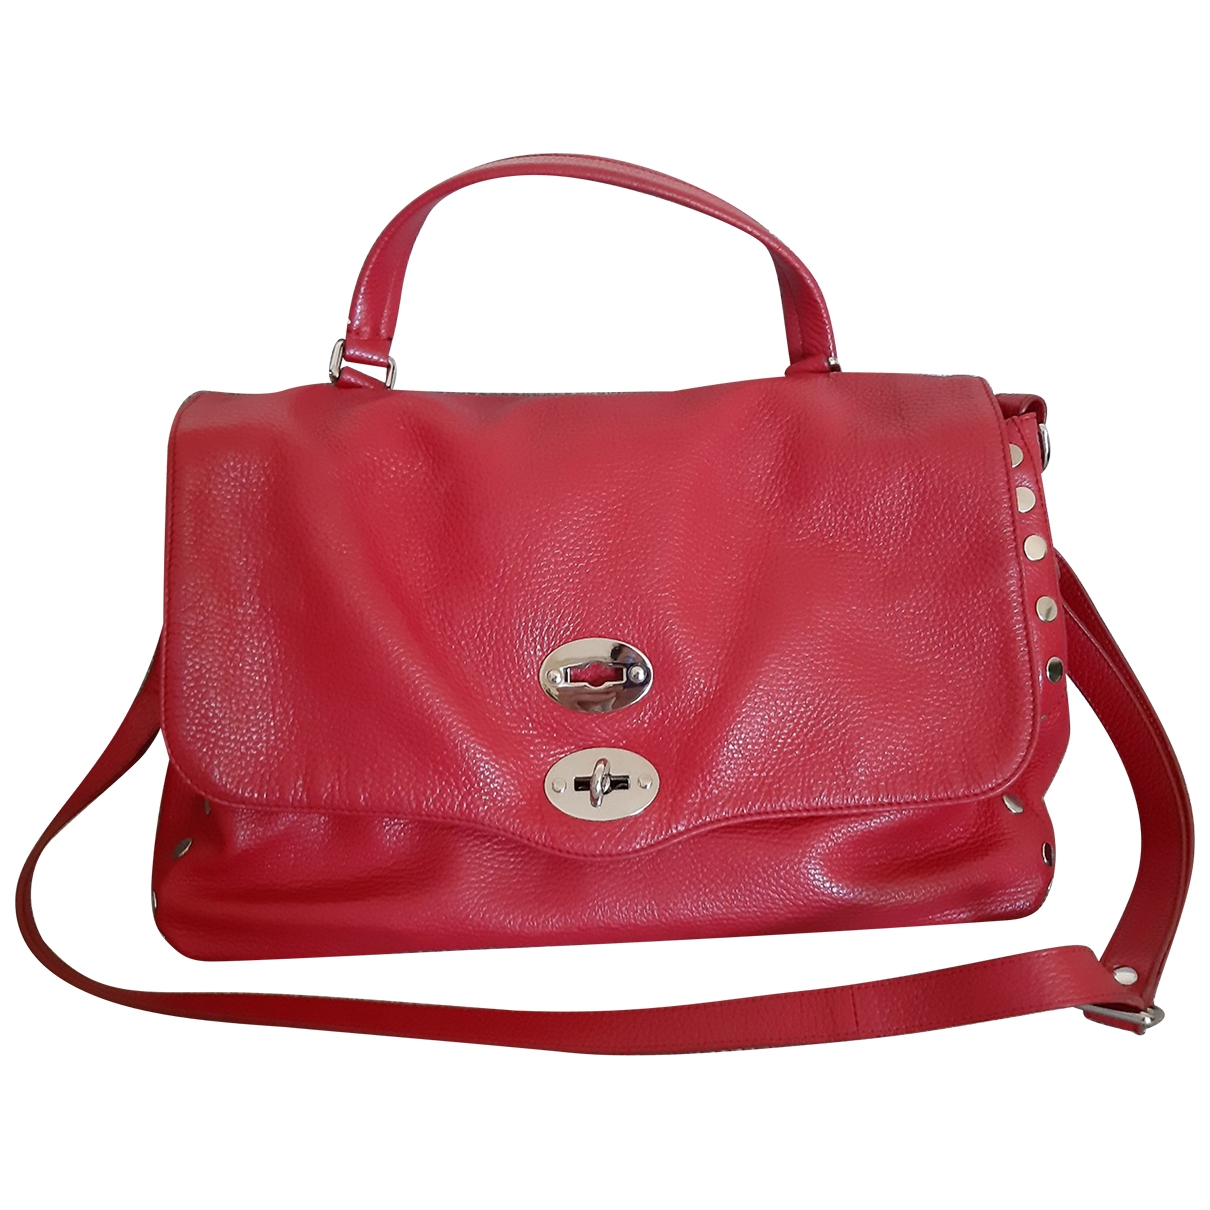 Zanellato \N Red Leather handbag for Women \N